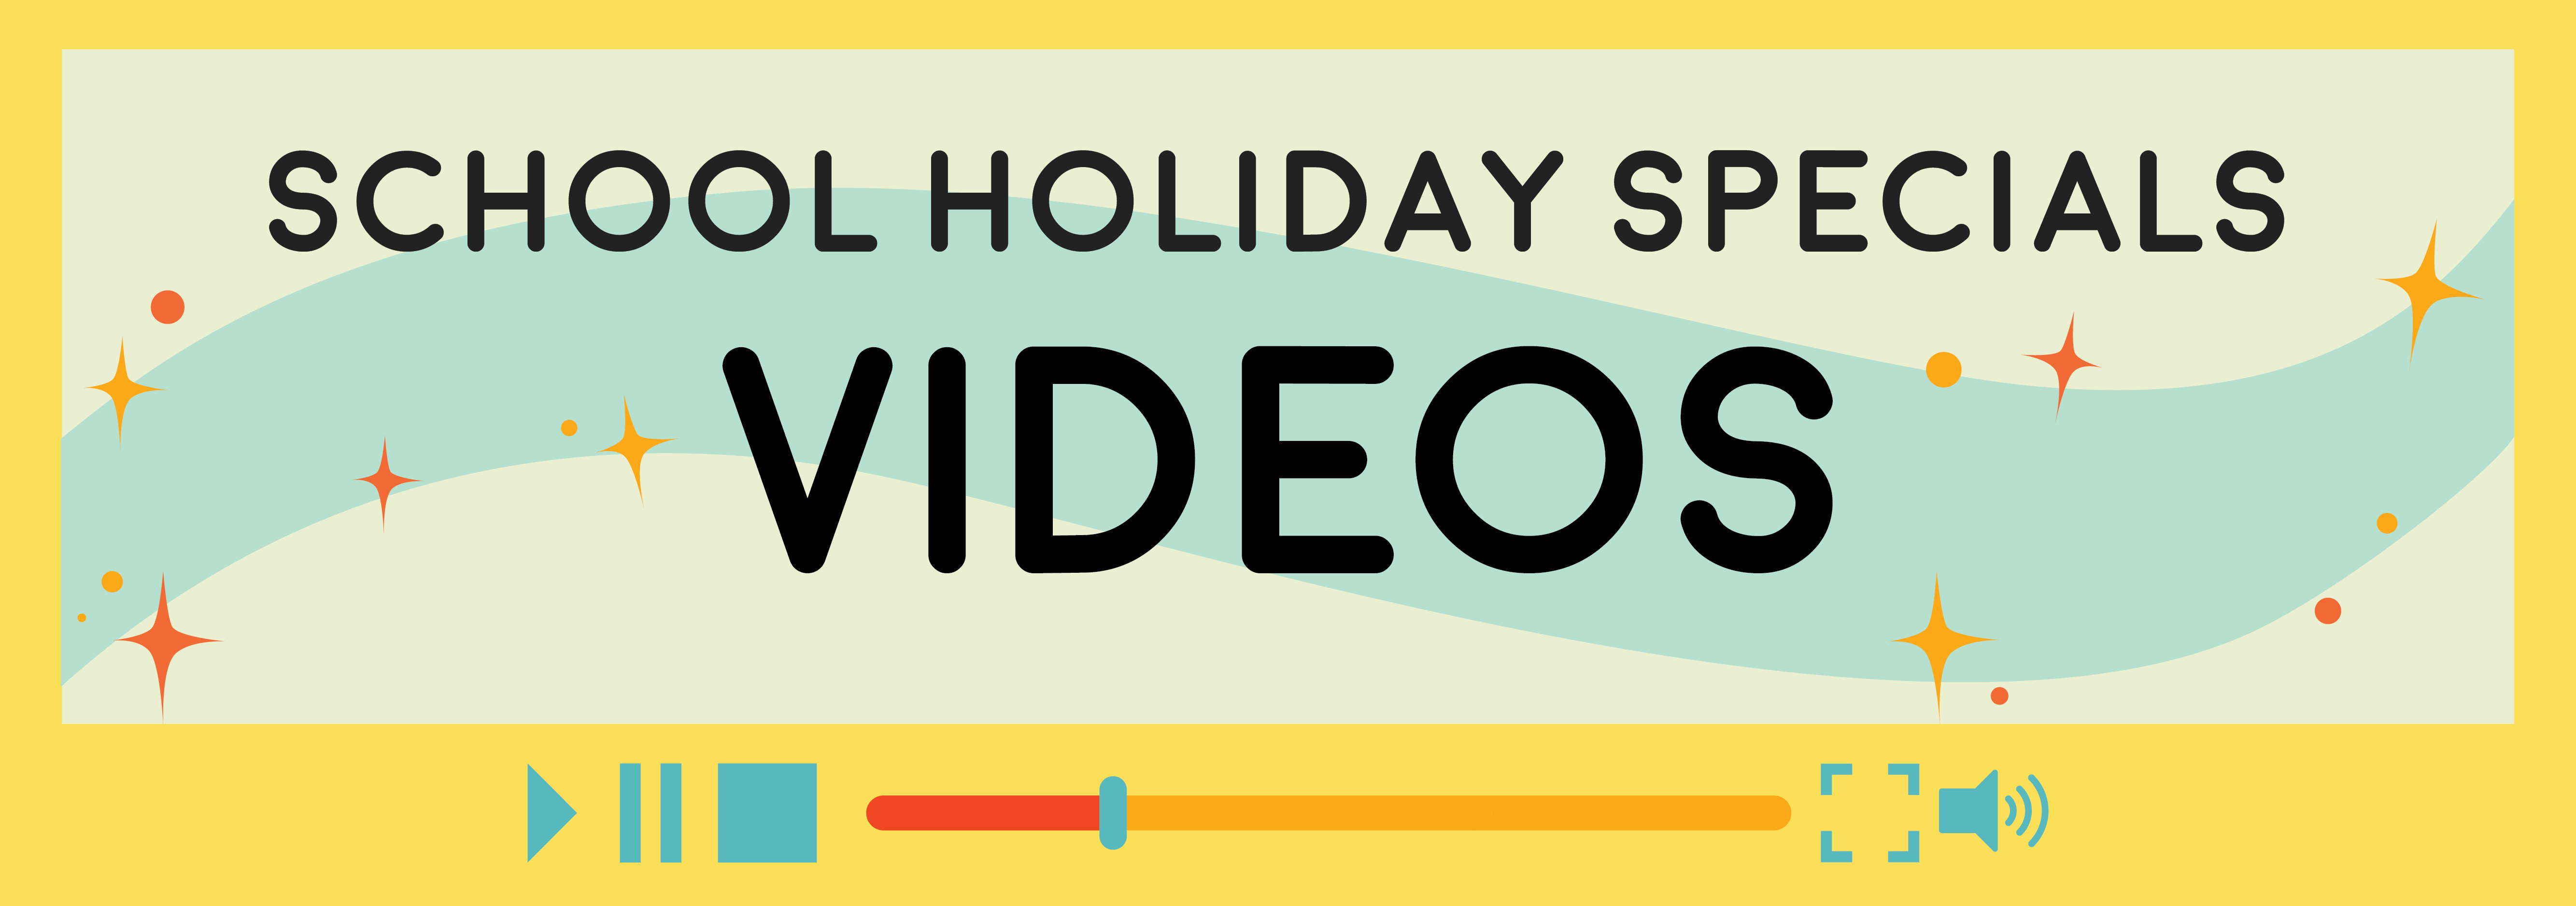 School Holiday Special Videos header